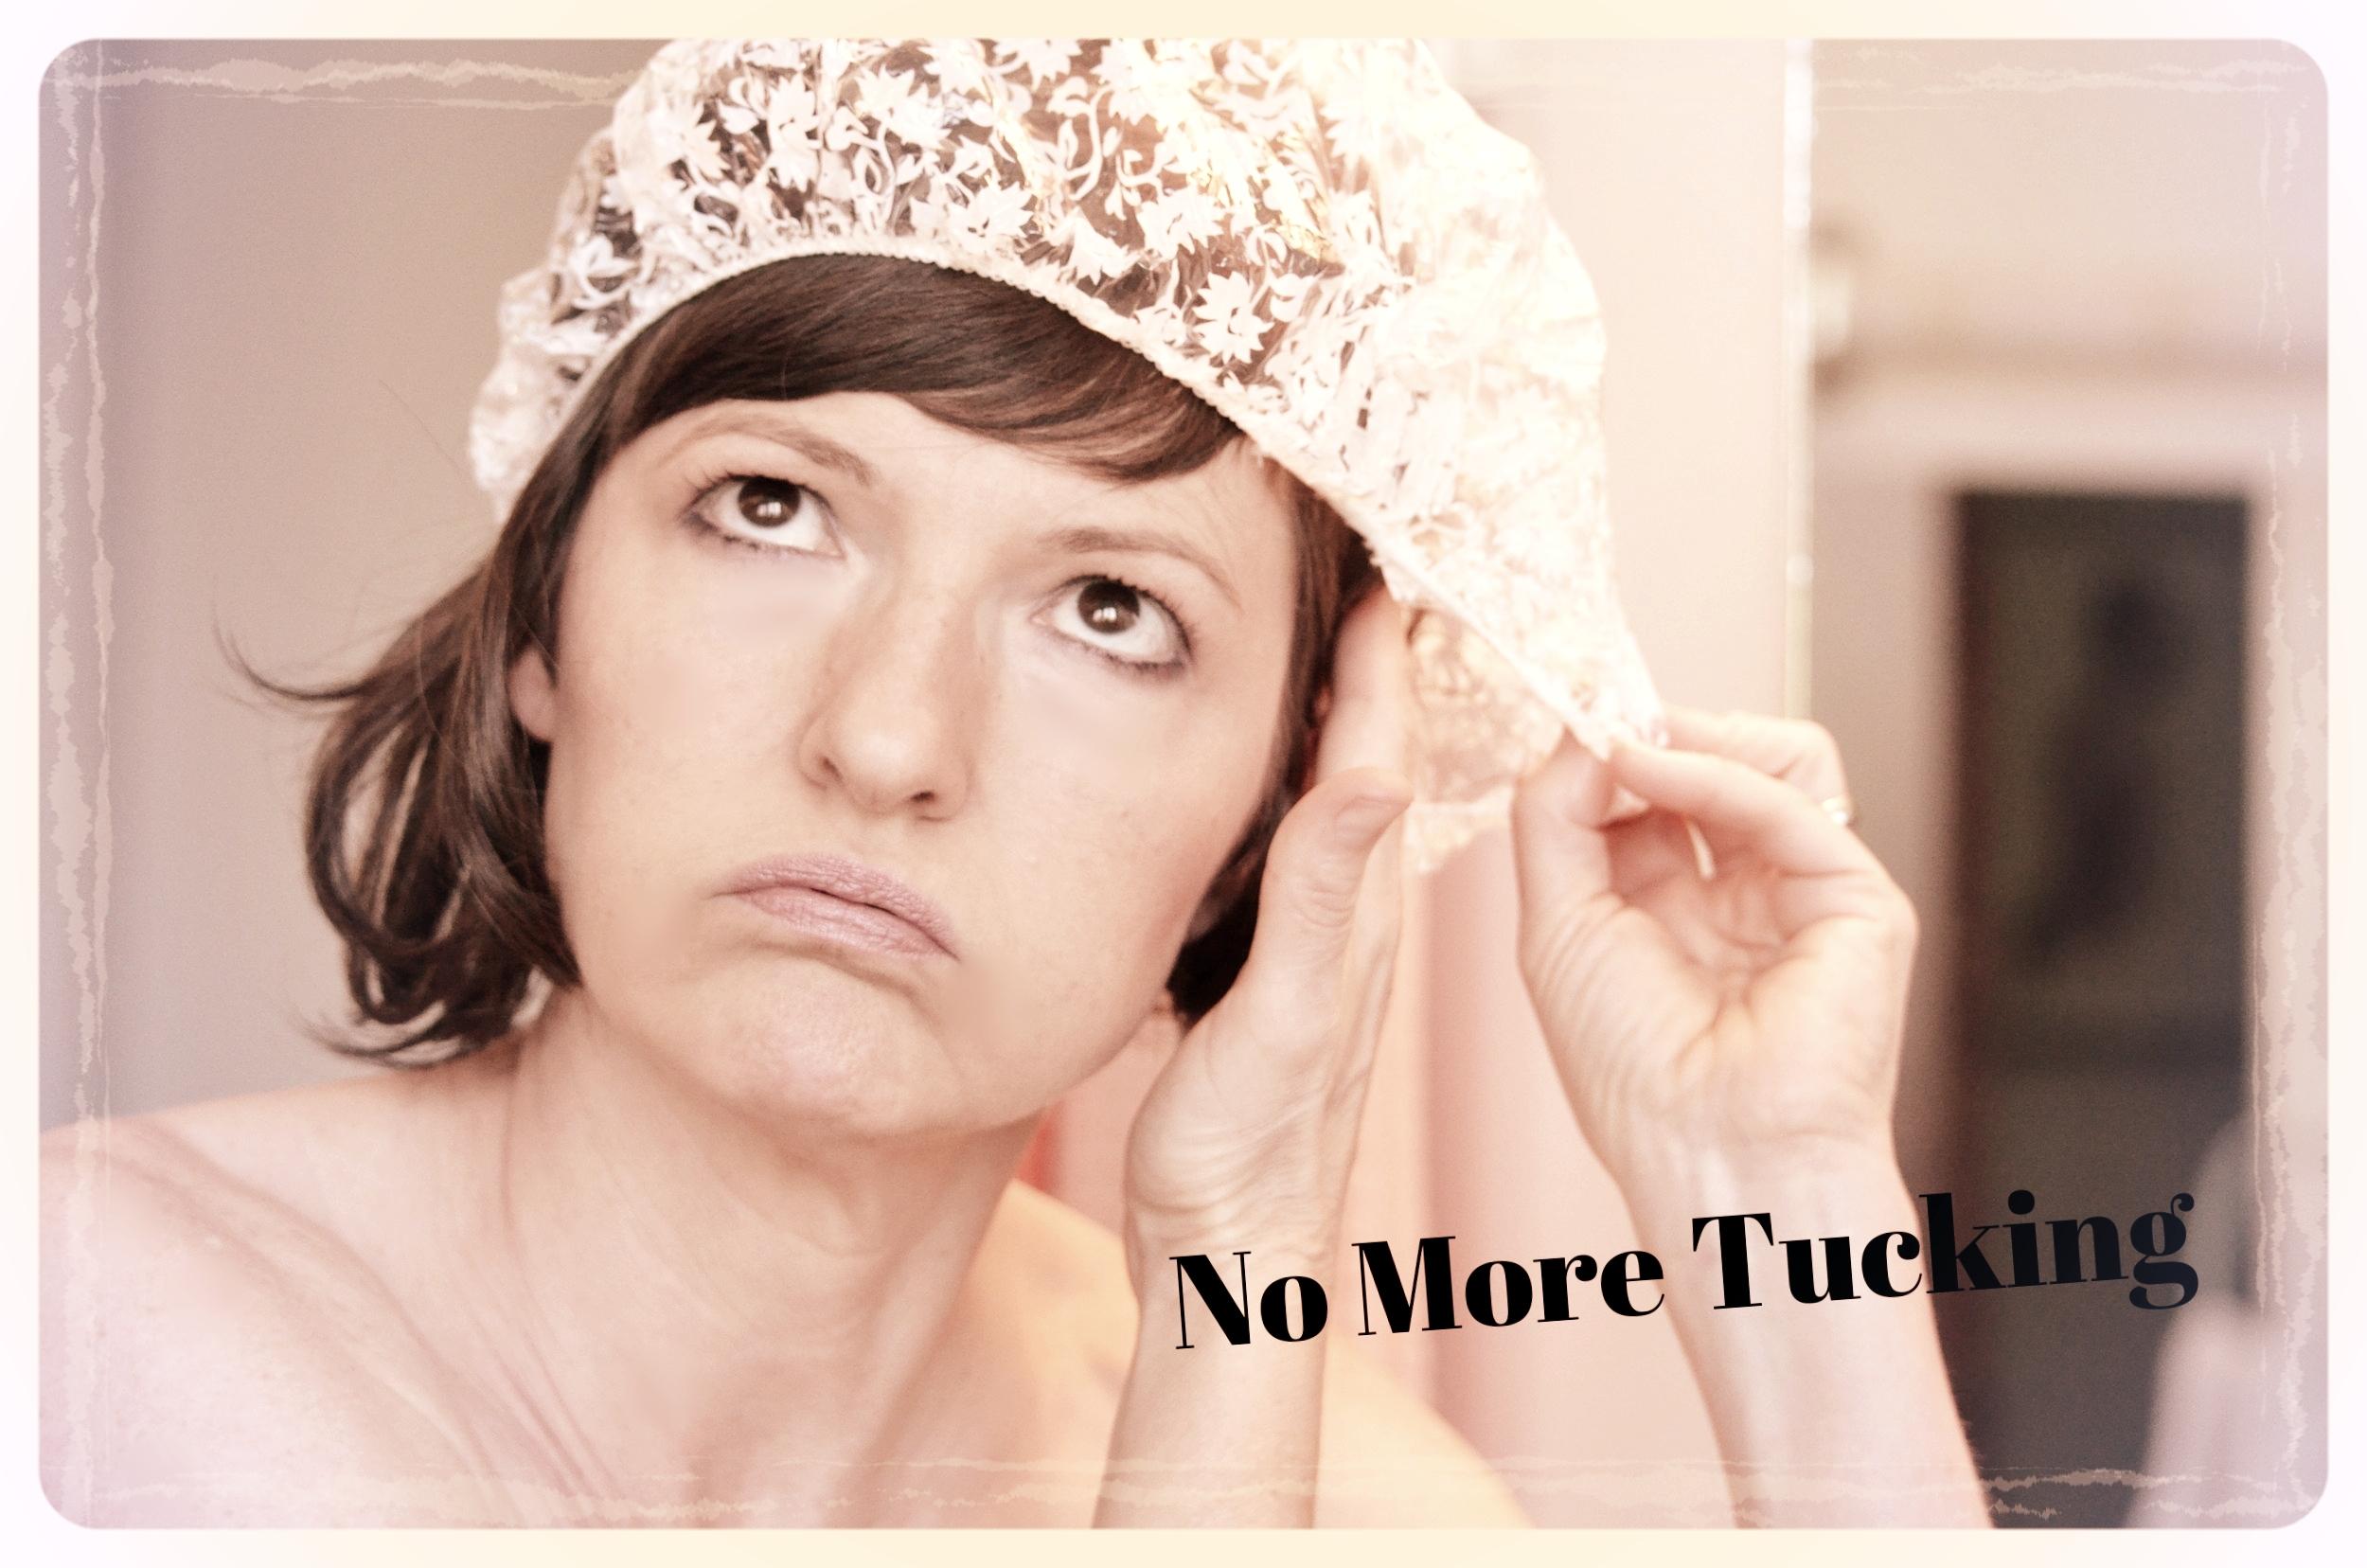 No More Tucking...